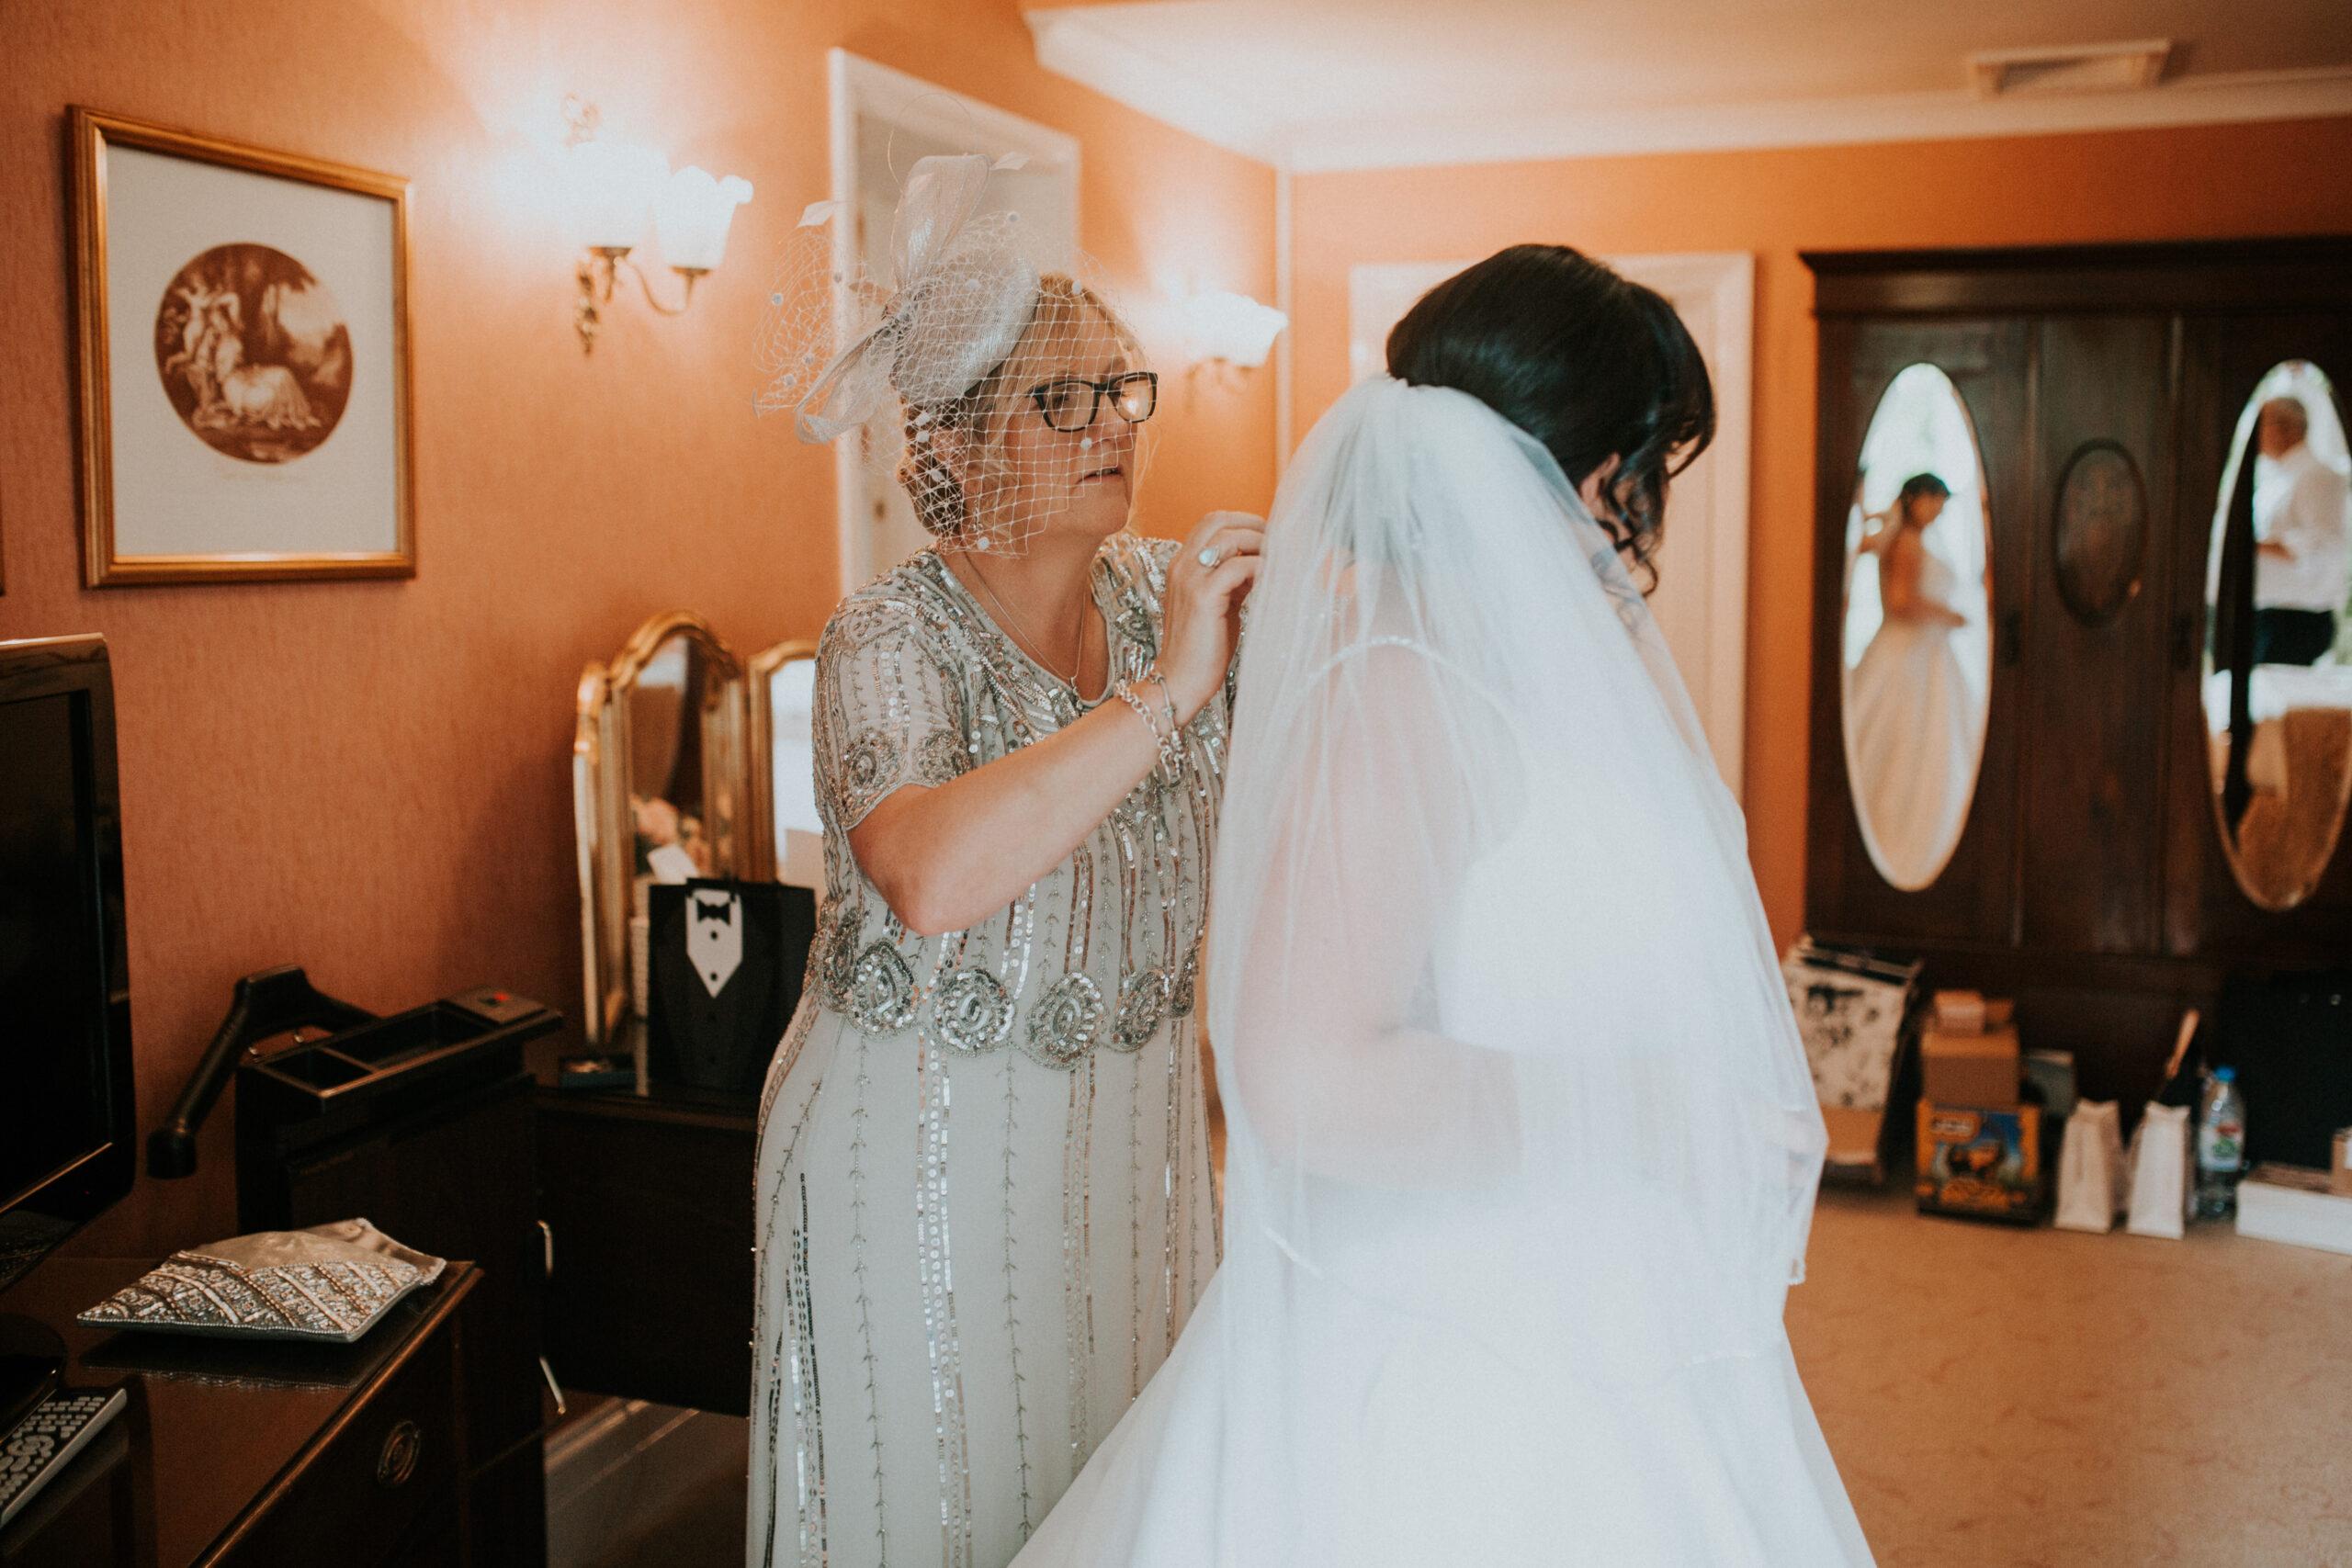 mother doing brides dress